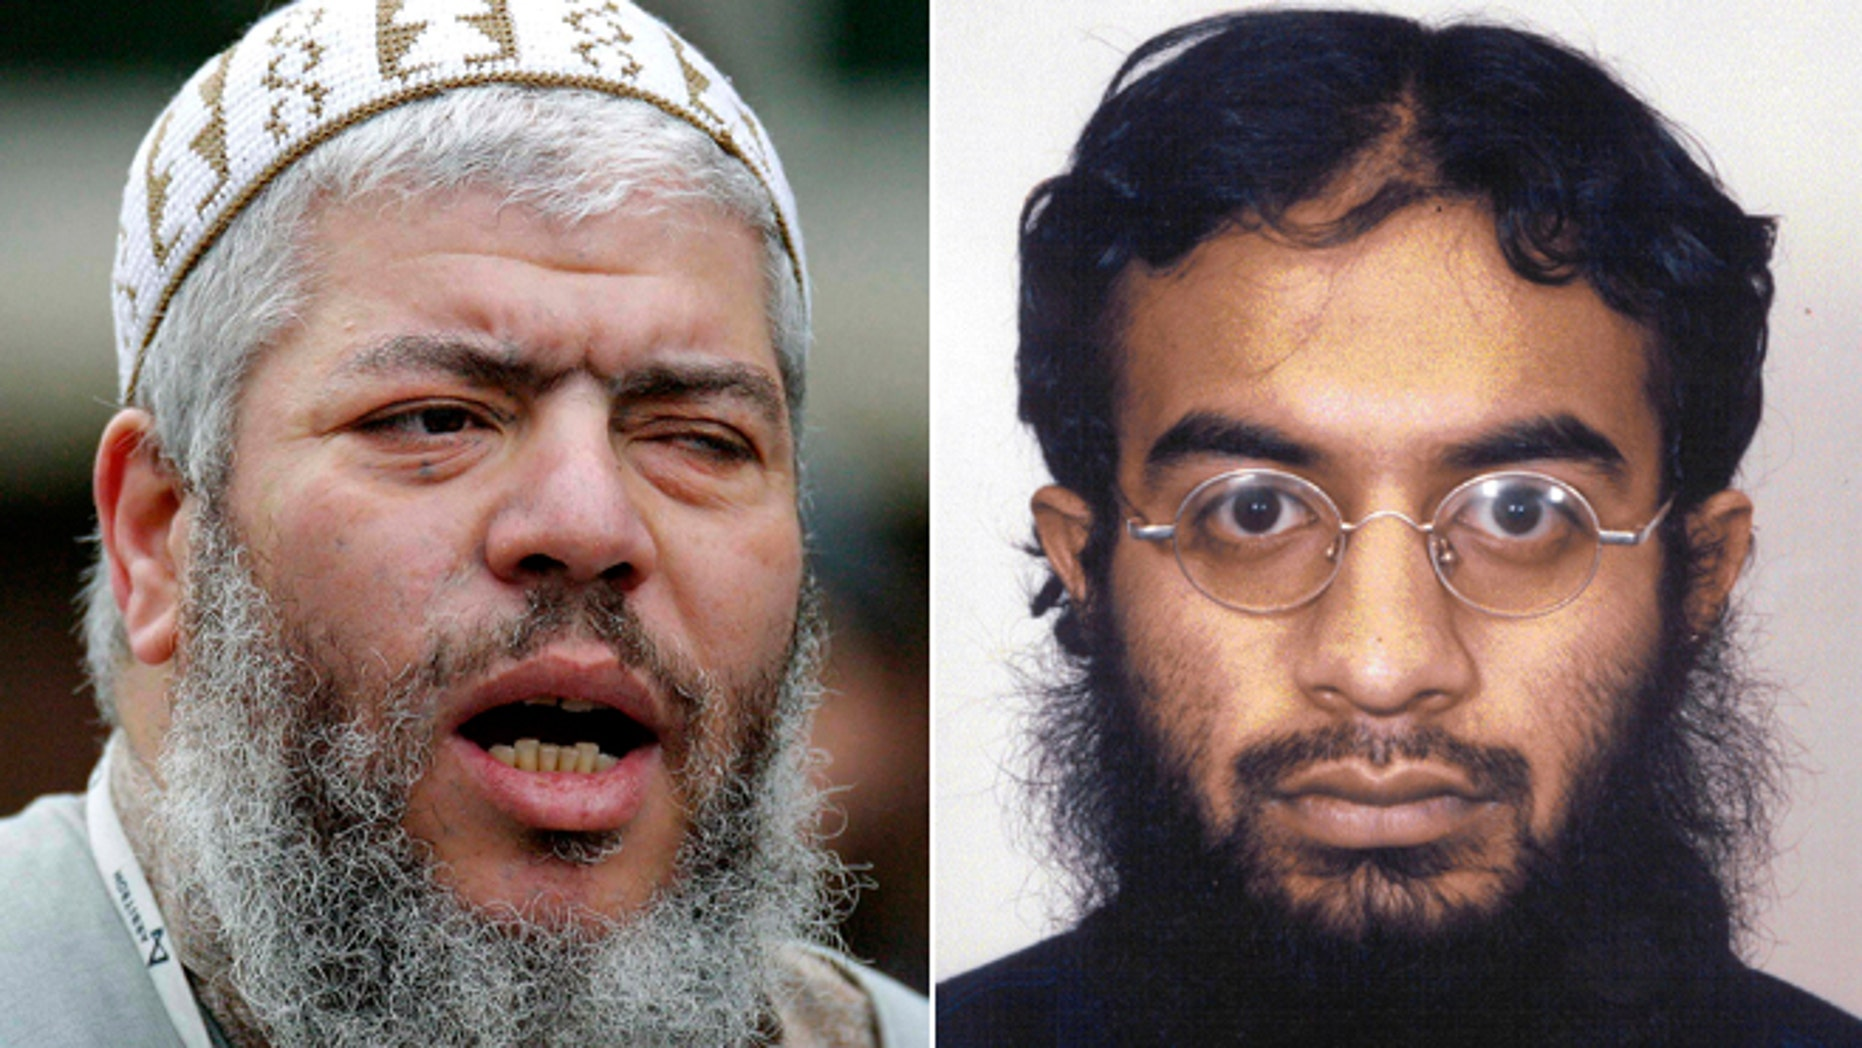 This split photo shows Muslim cleric Abu Hamza al-Masri, left, and Saajid Badat, right.